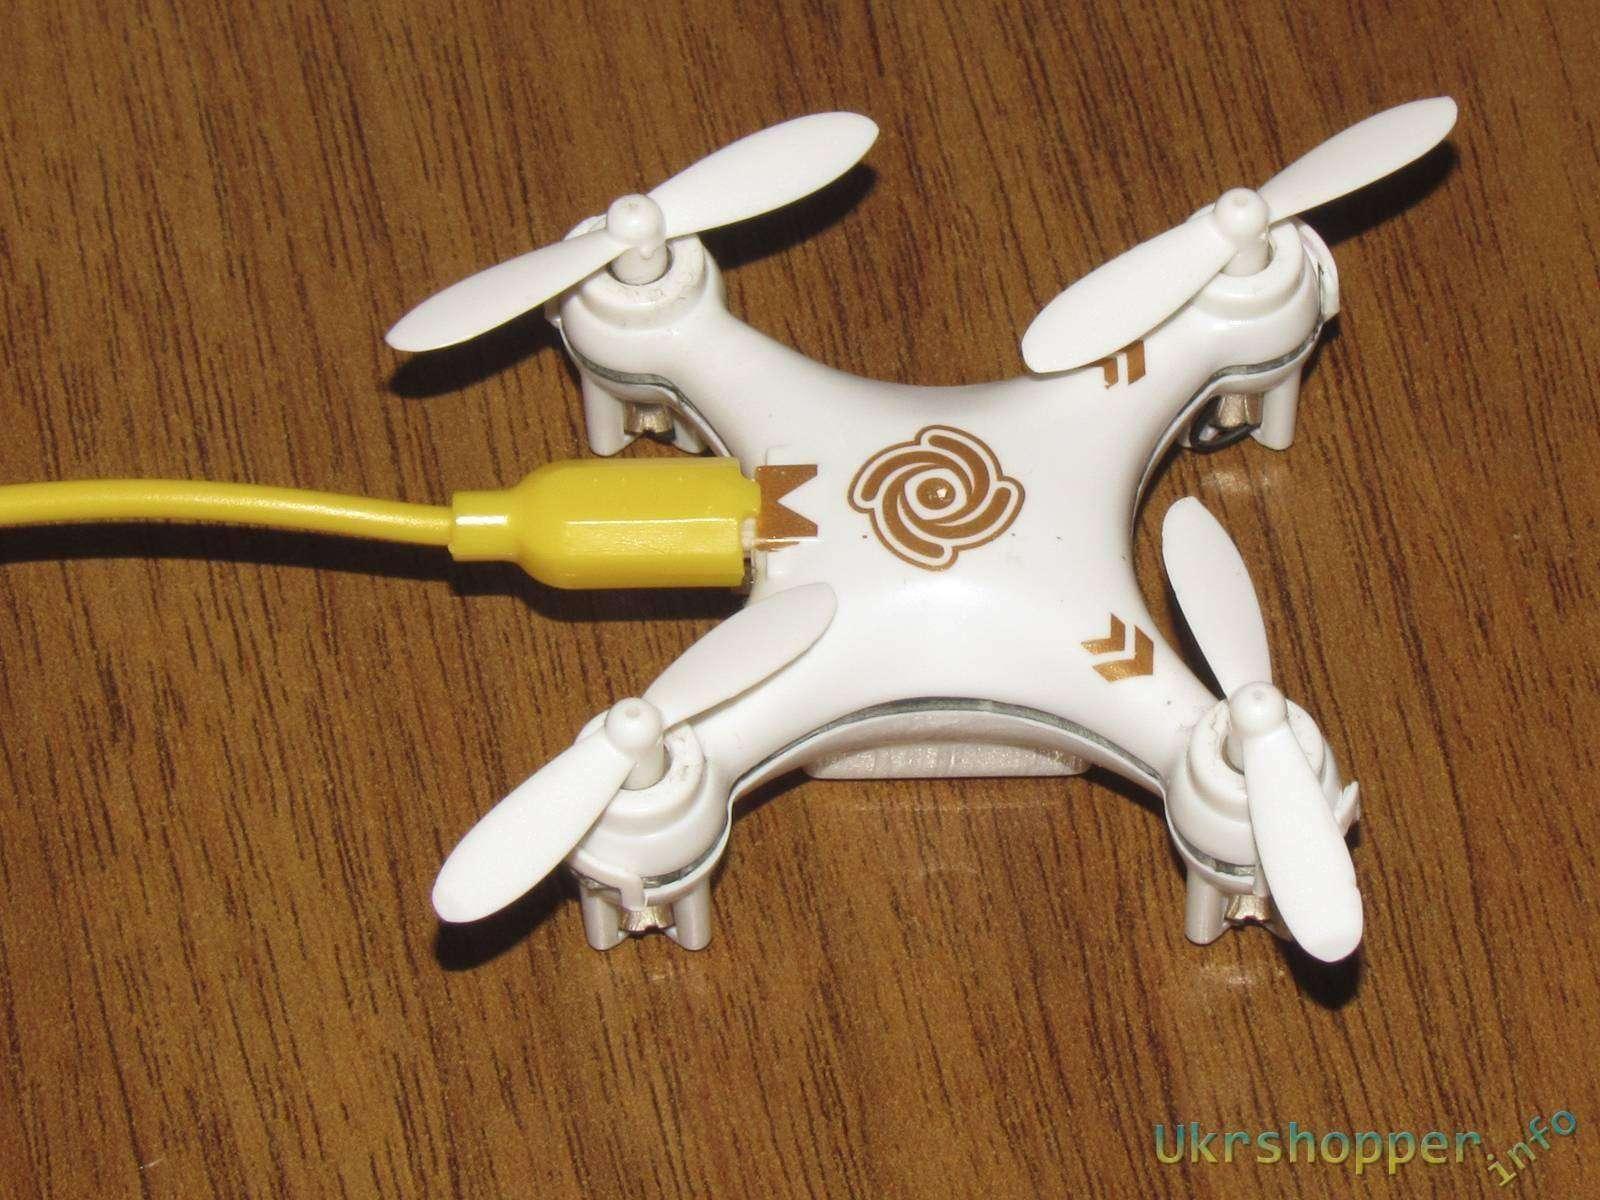 Banggood: Обзор крохотного квадрокоптера Cheerson CX-10A